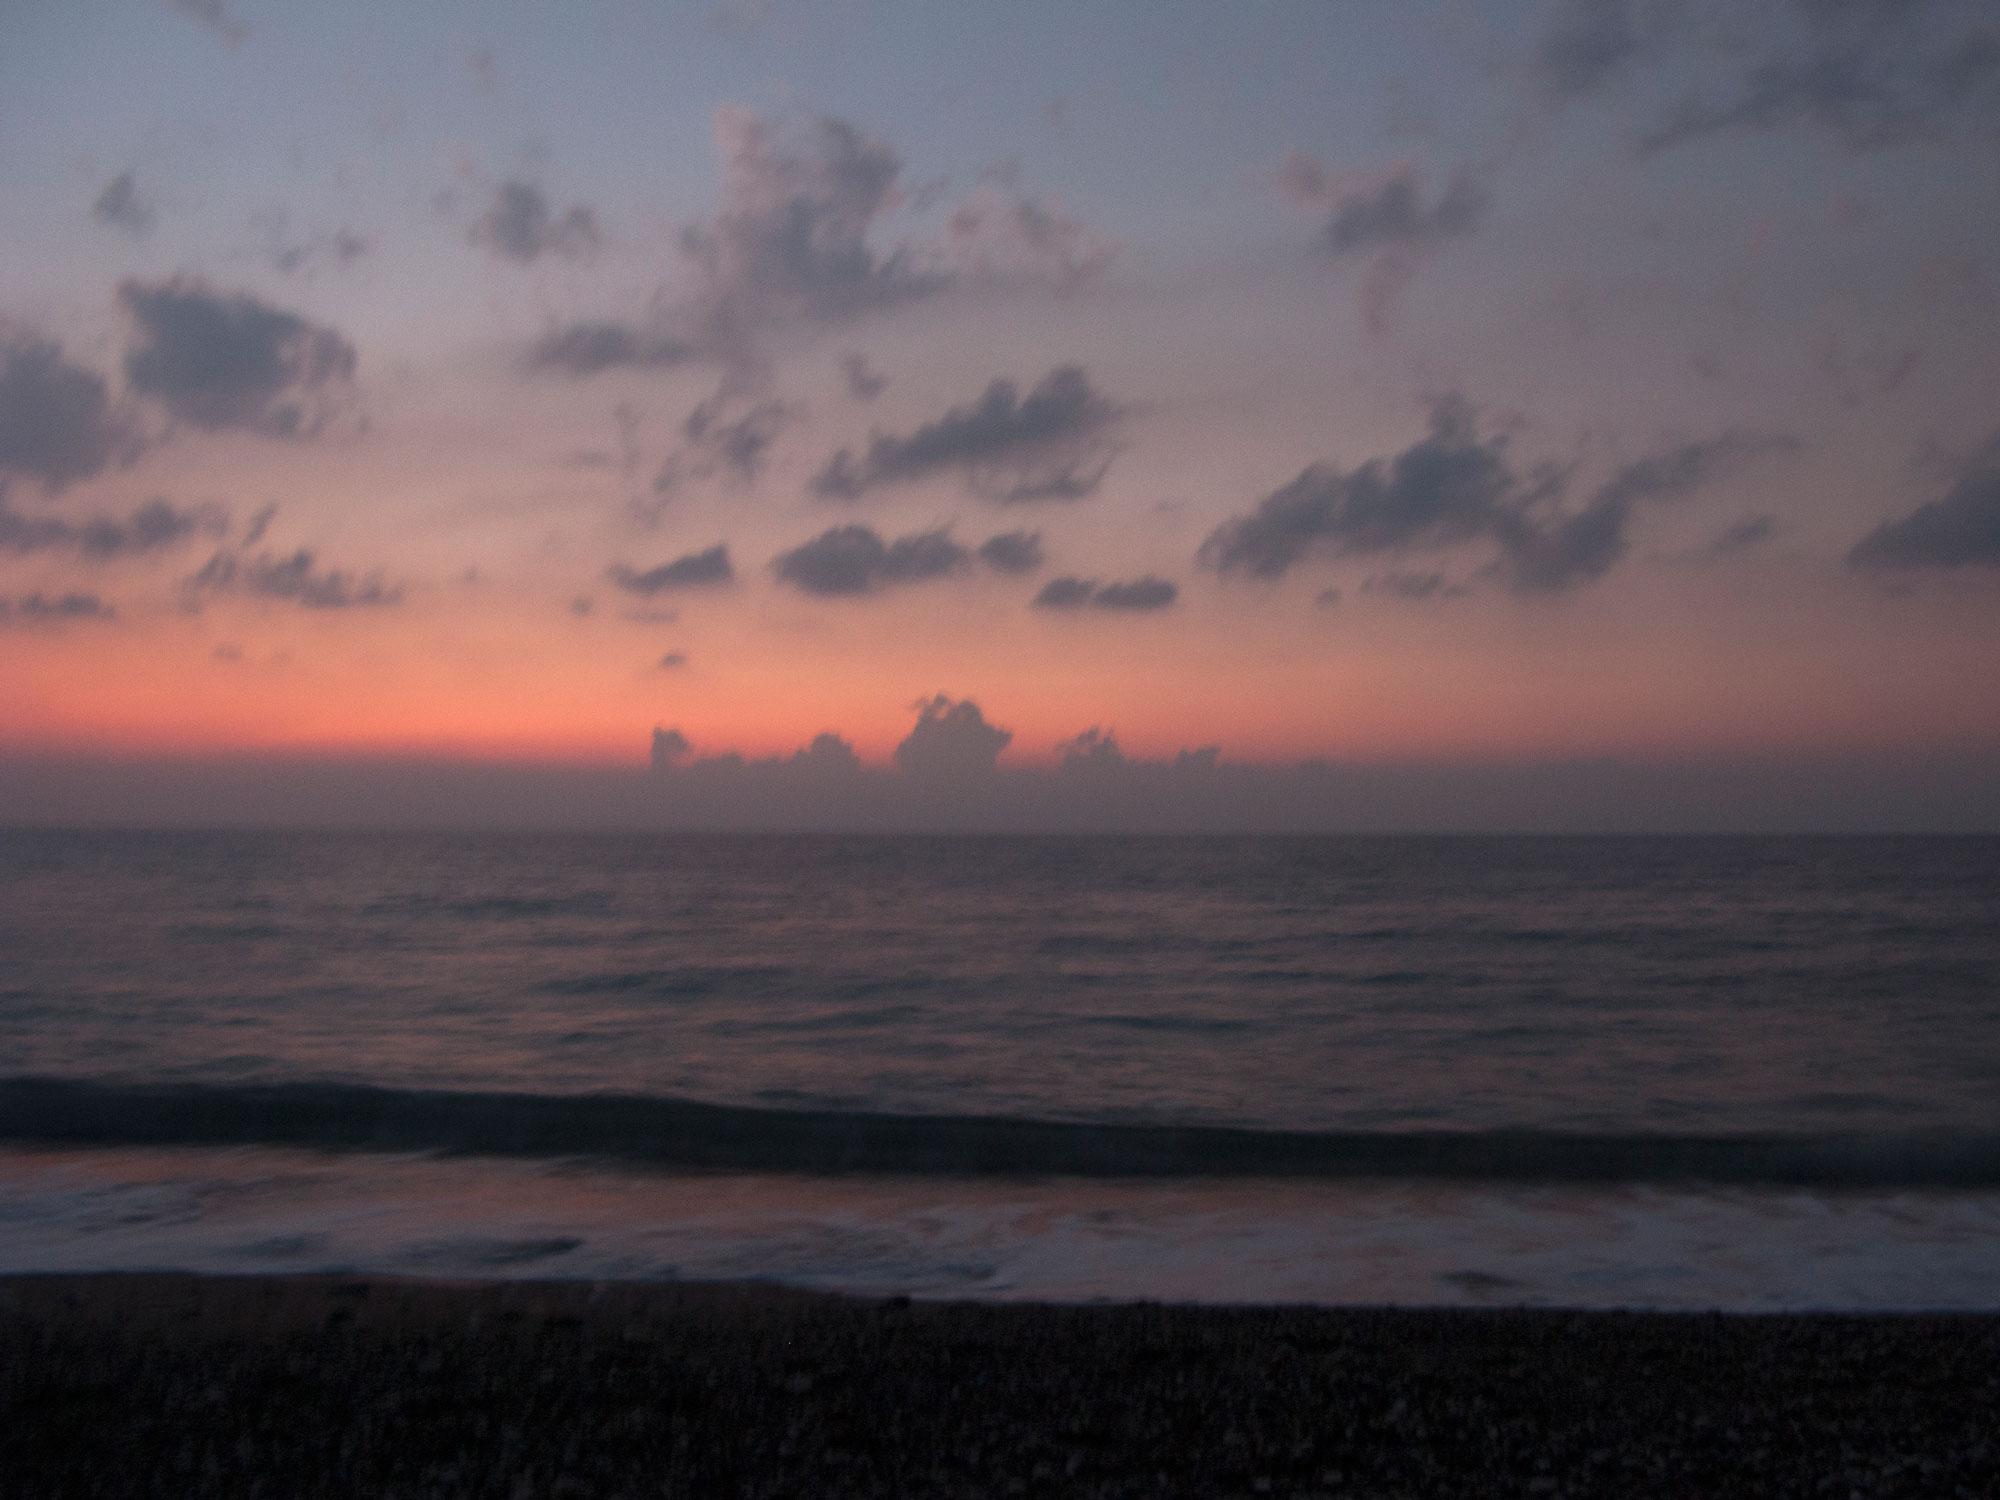 Turkey Cirali sunrise turtles beach pink